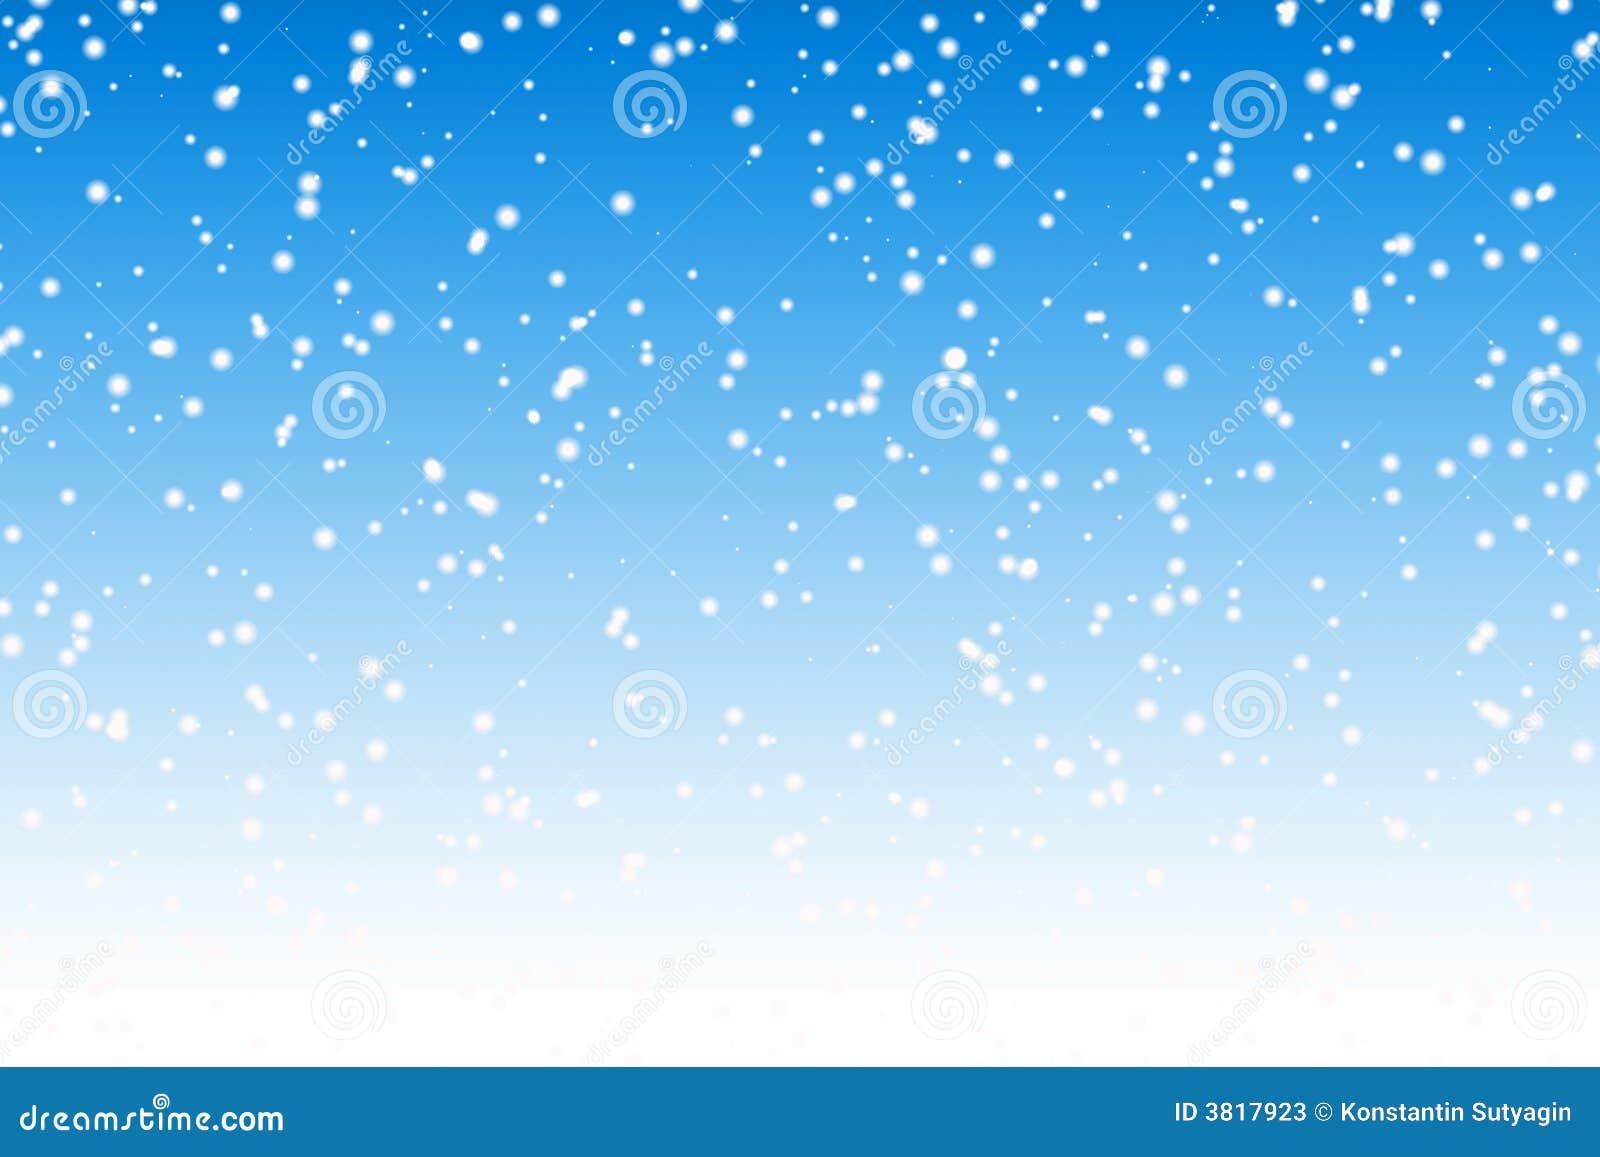 Snow Background Stock Photos - Image: 3817923 Falling Snowflake Vector